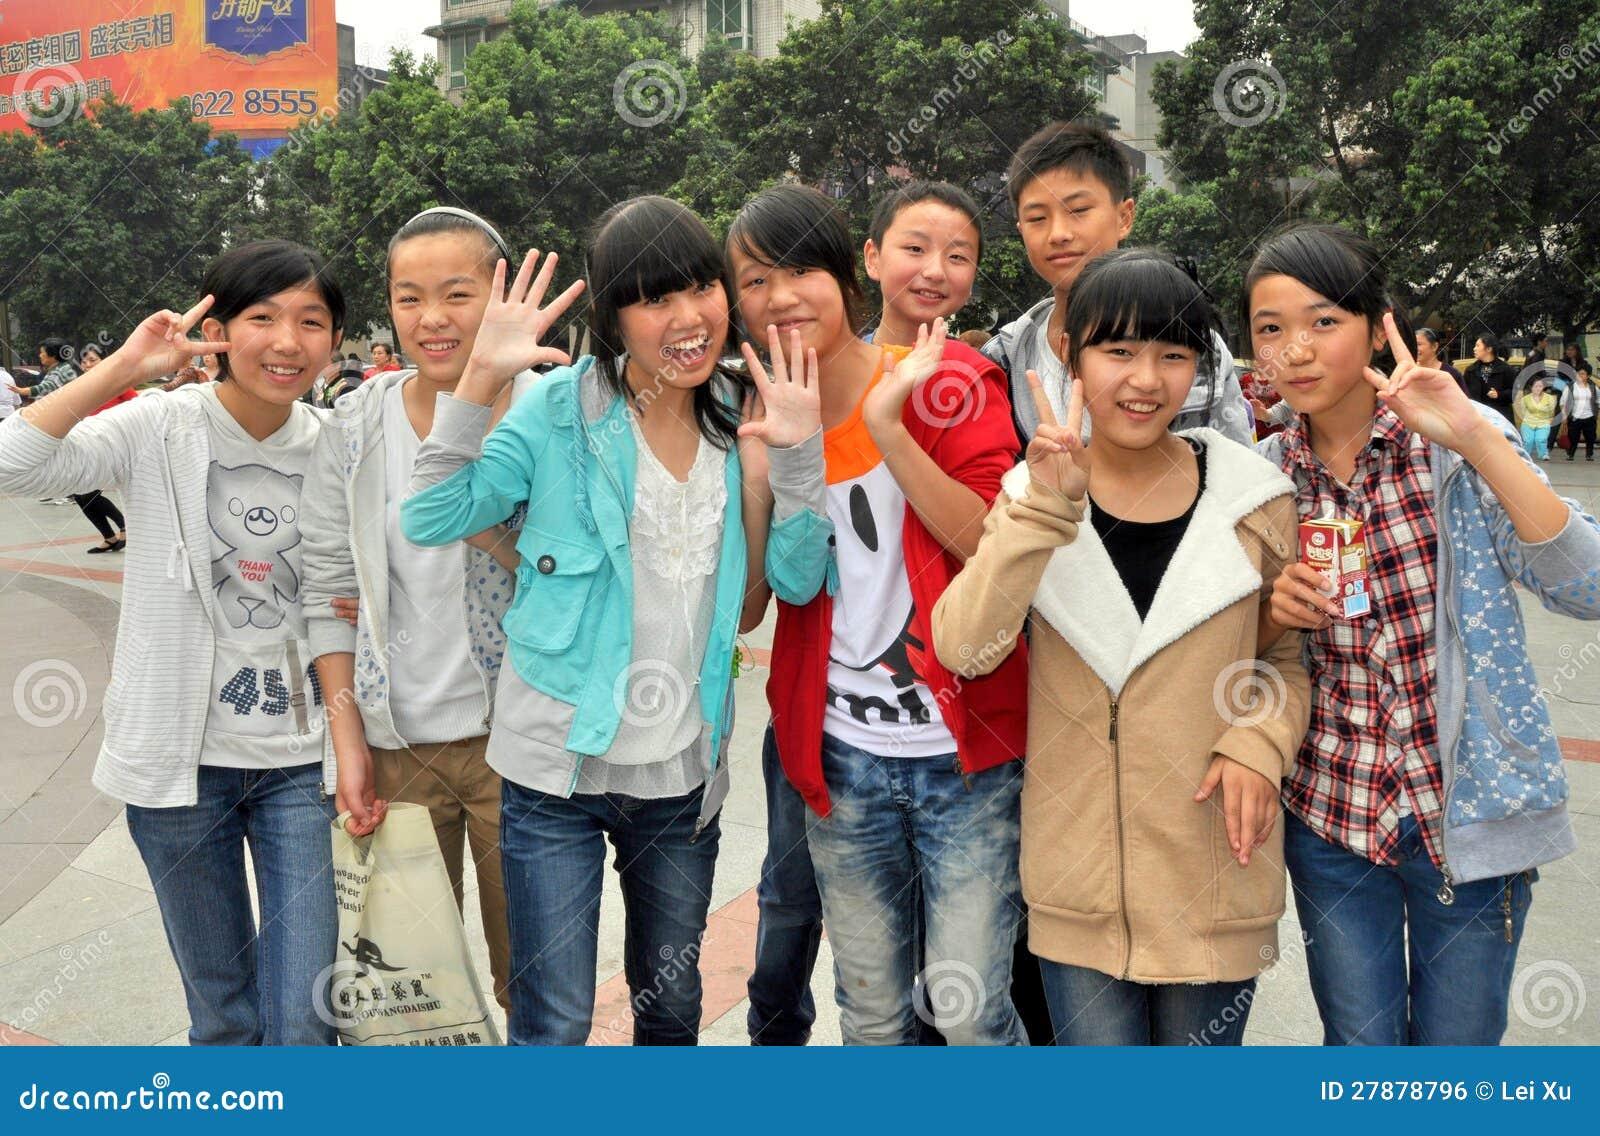 Institute of south asian studies